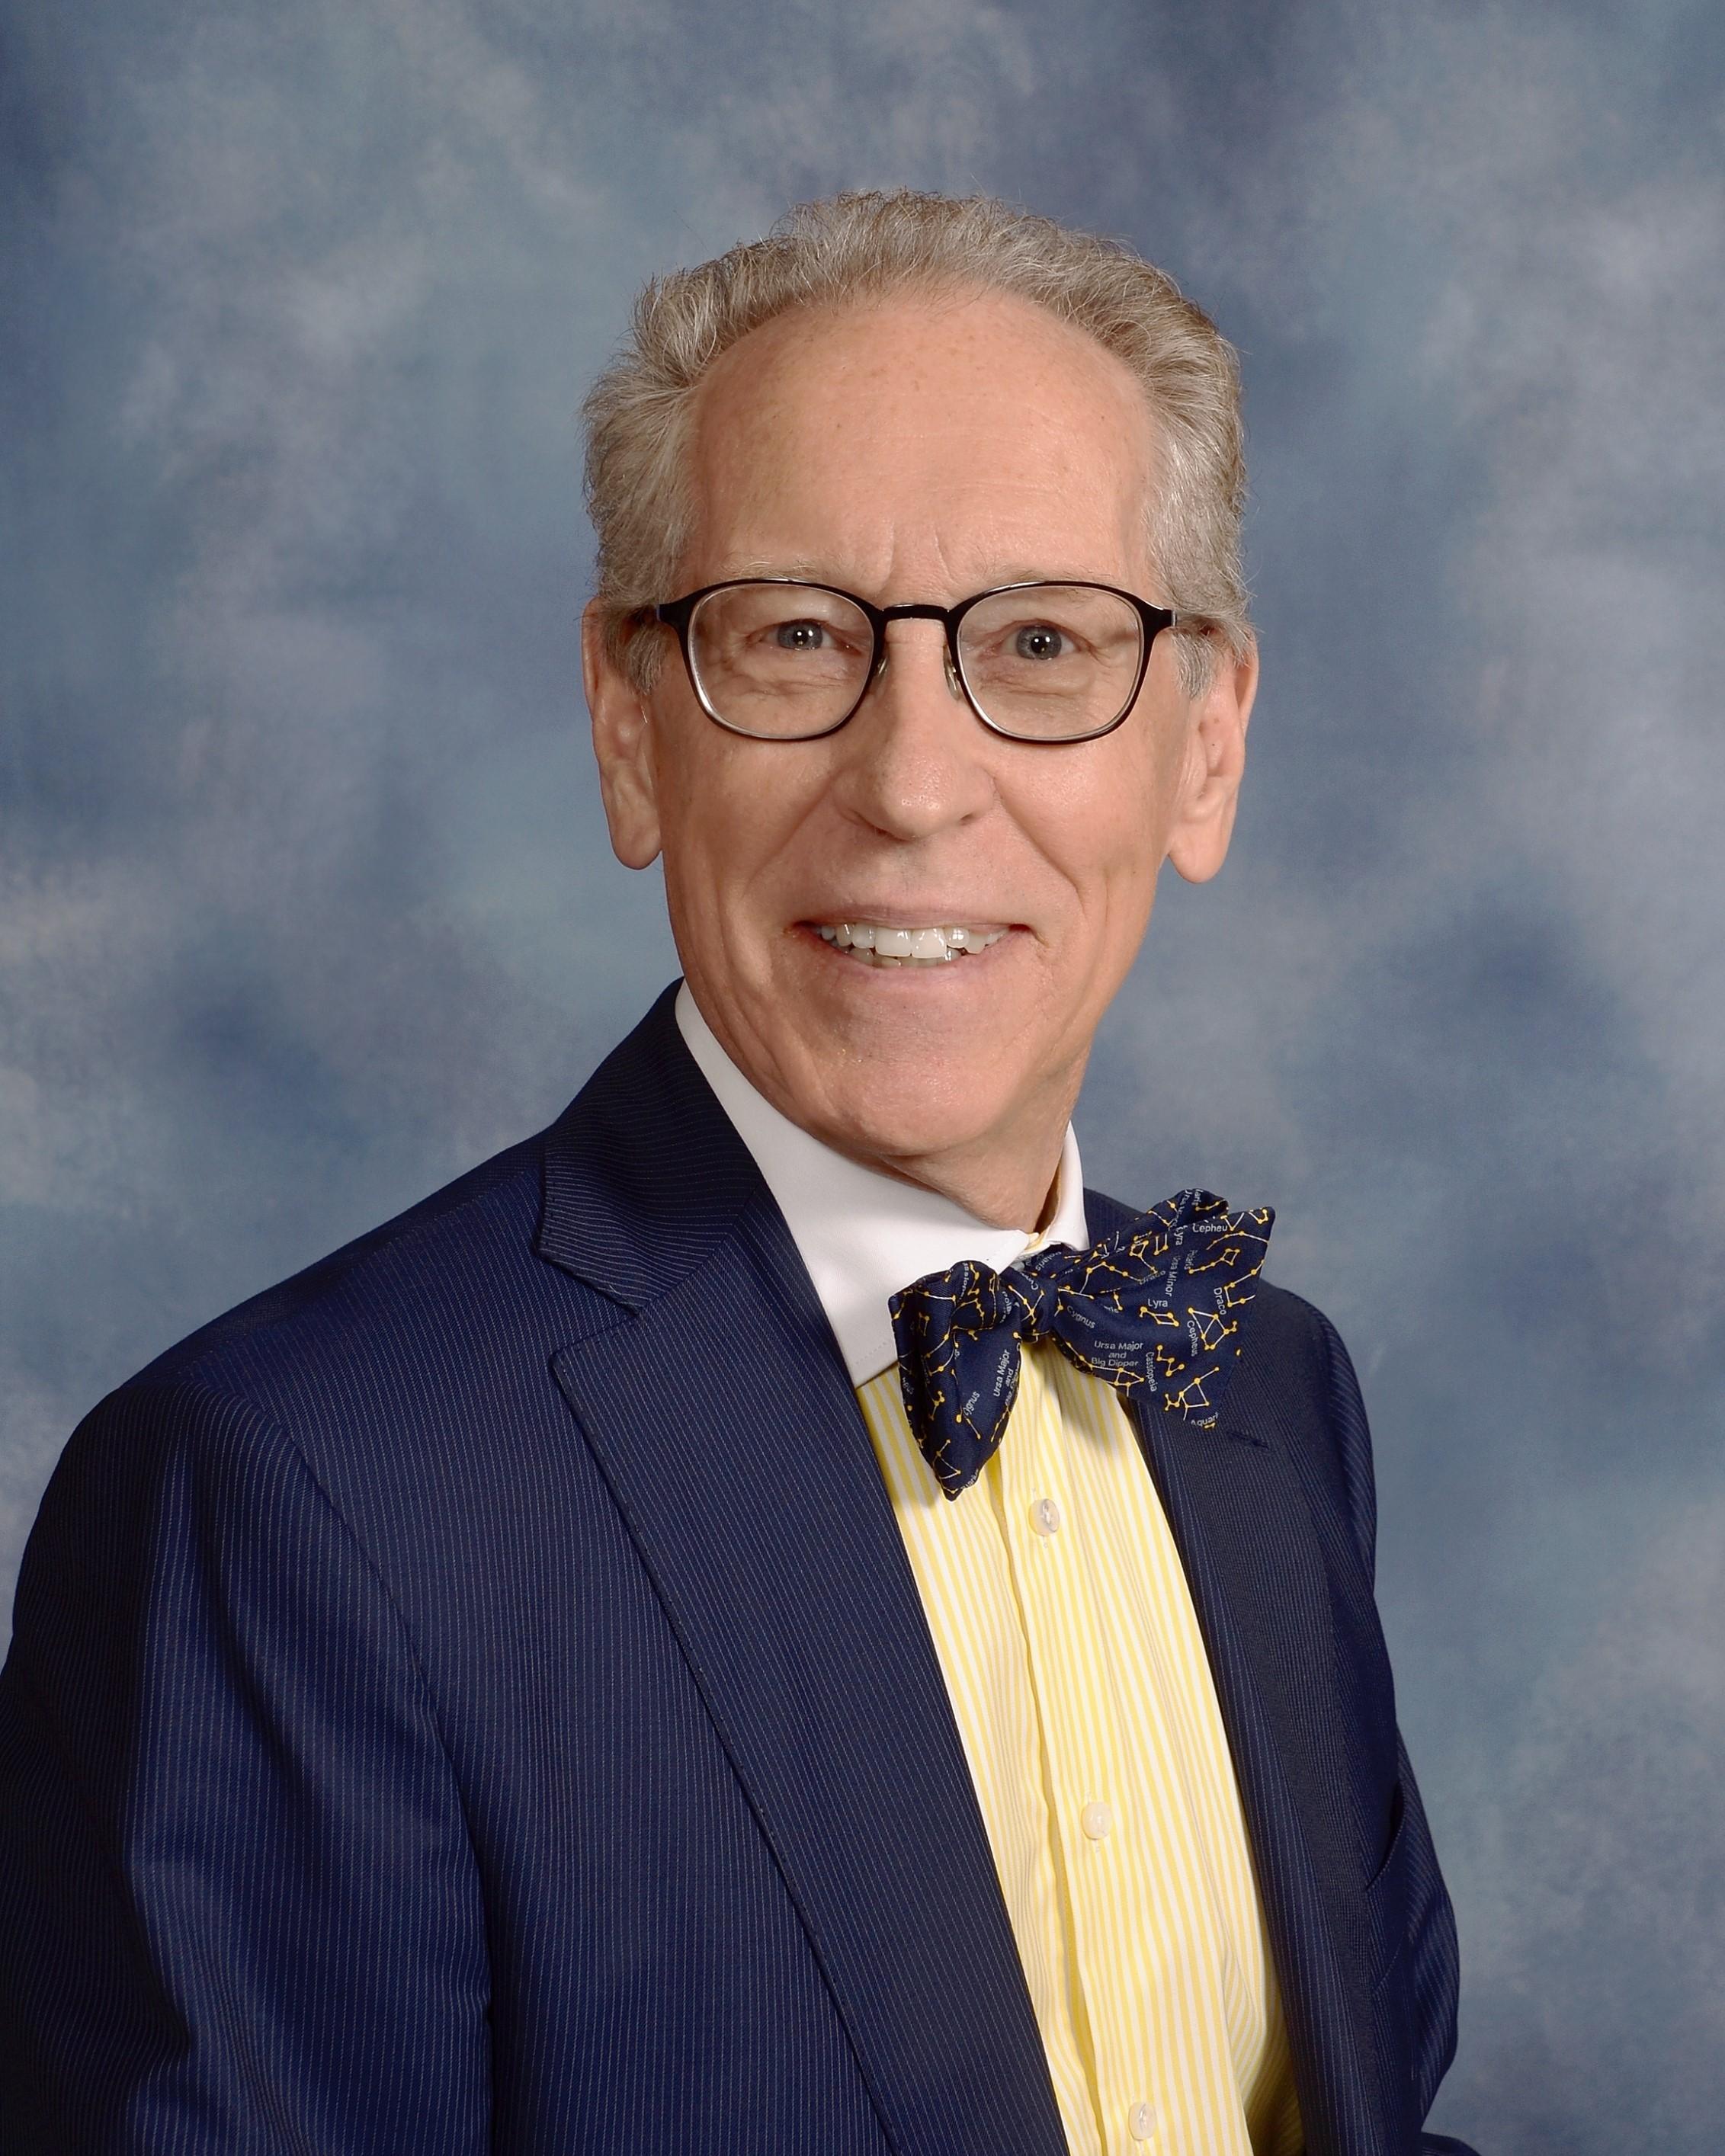 NEIL BRYSON Financial Advisor